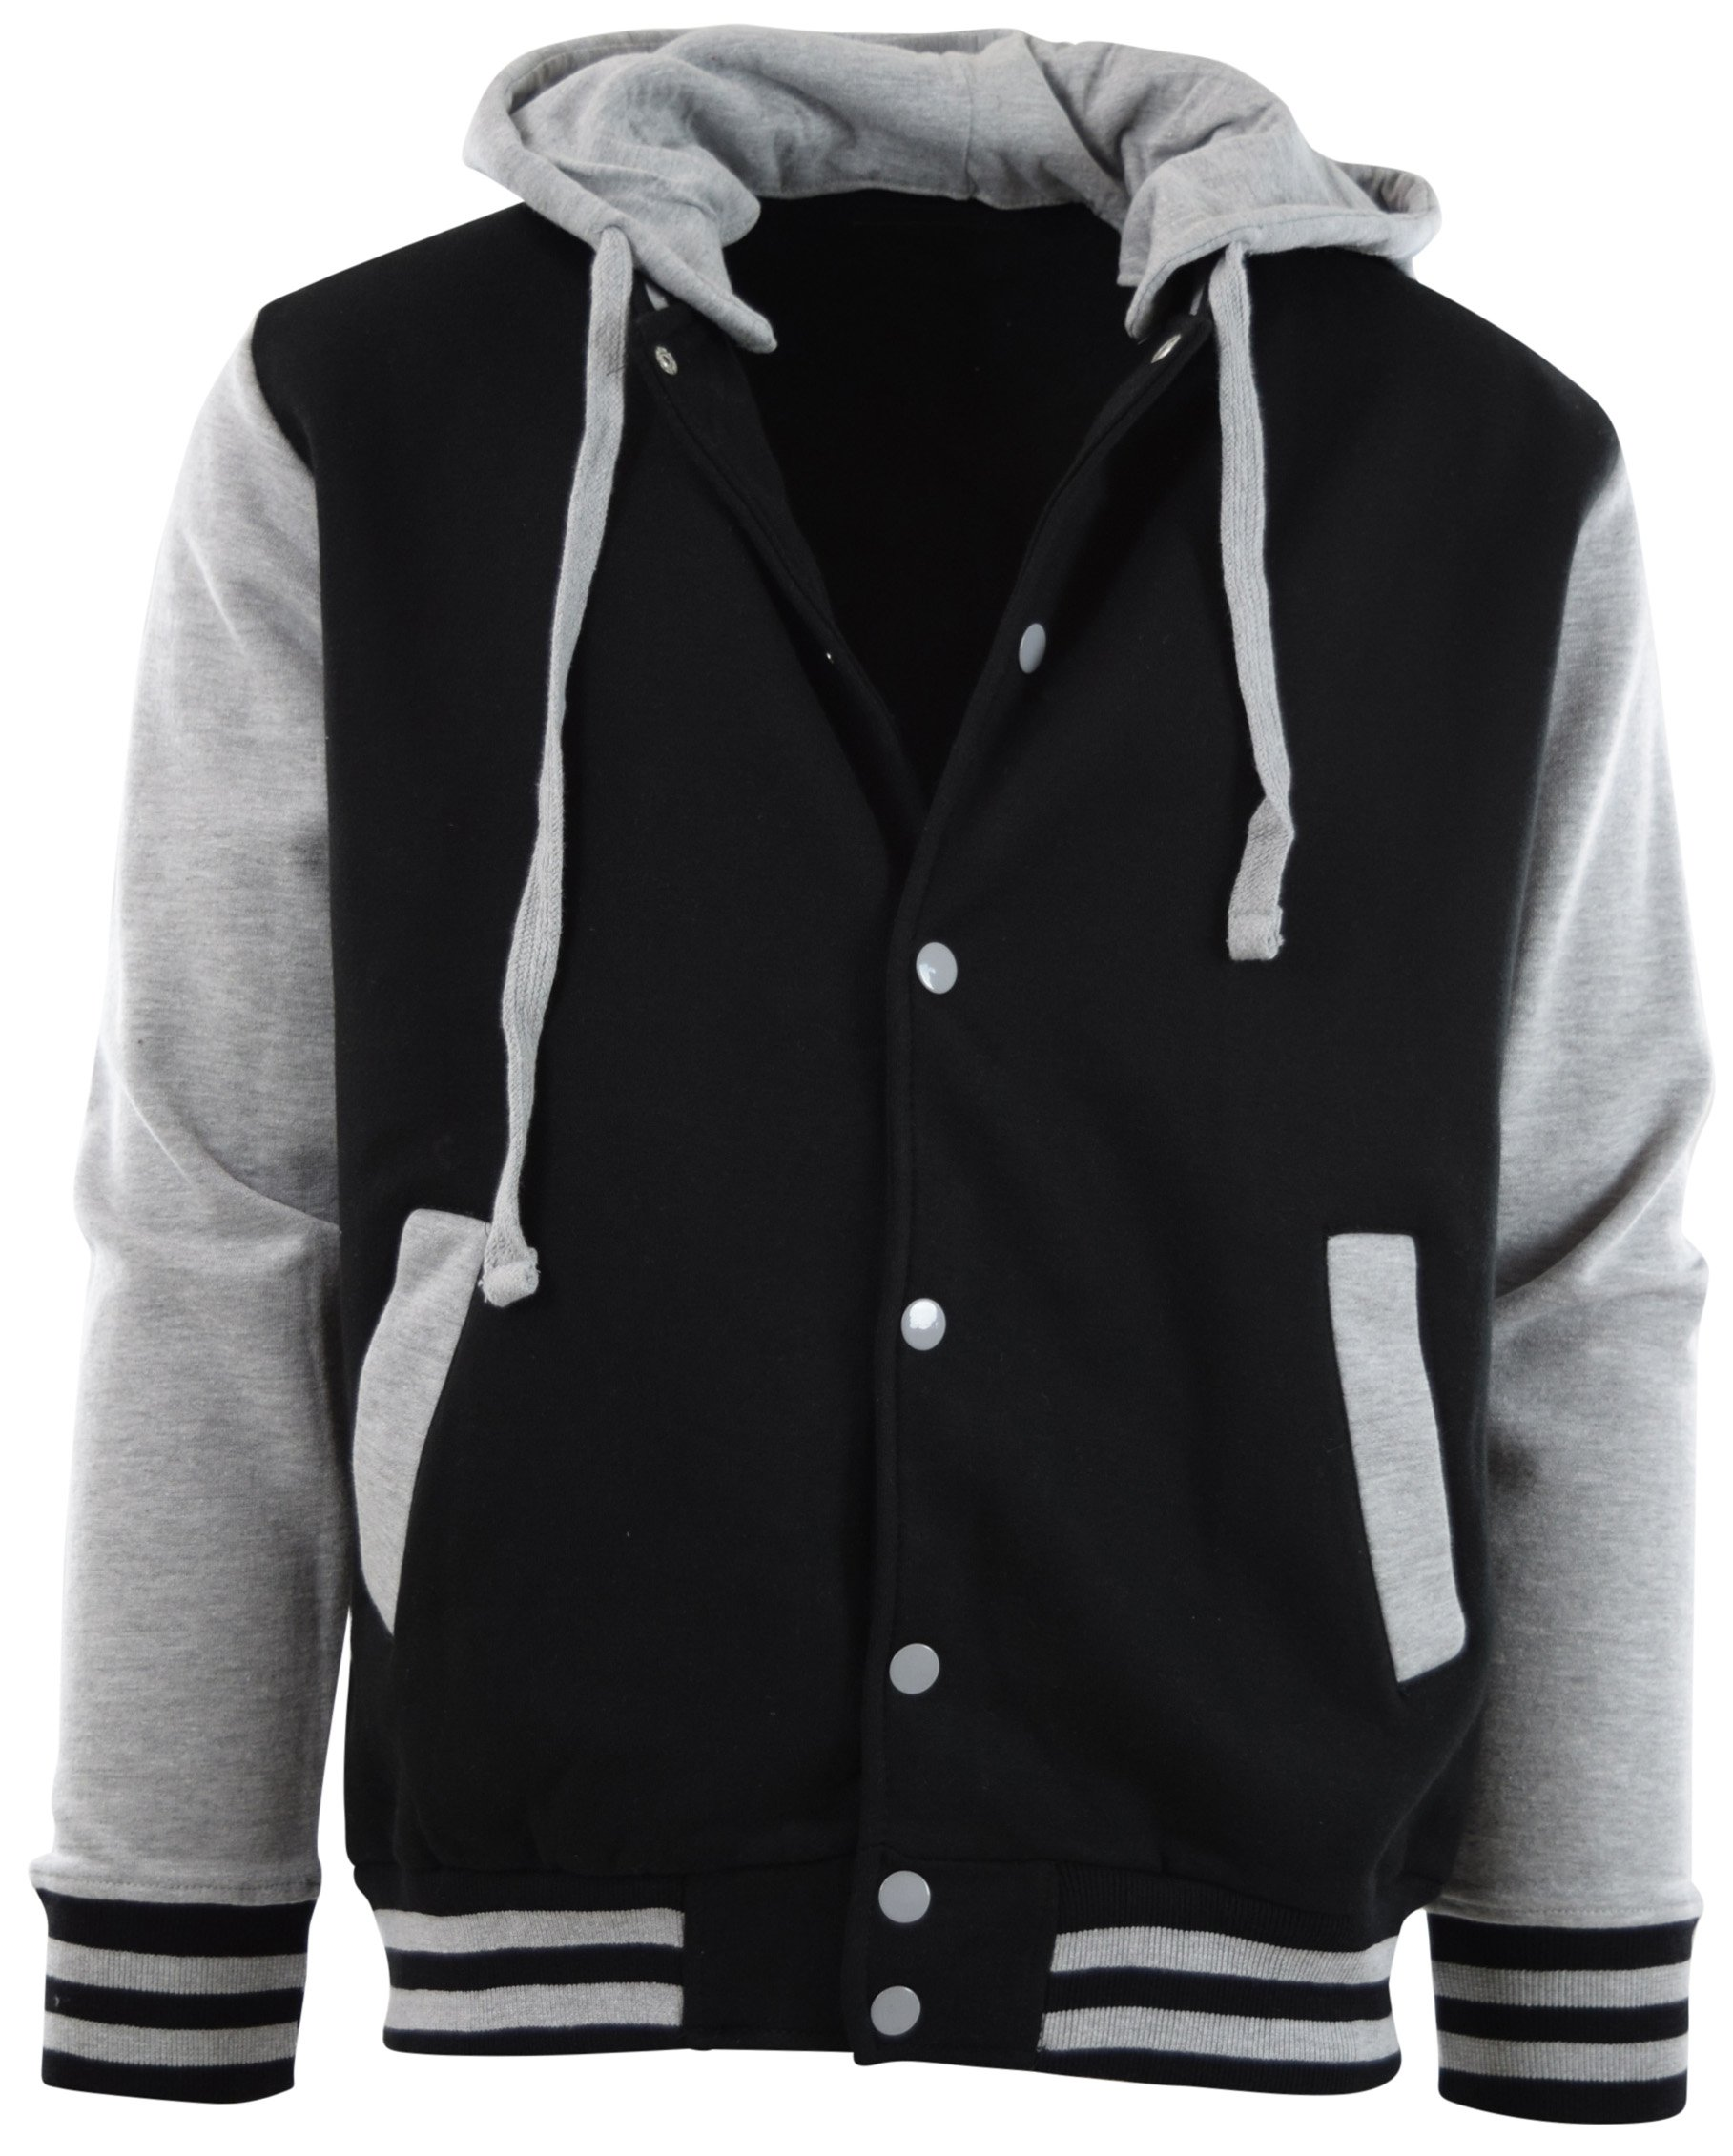 ChoiceApparel Mens Baseball Varsity Jacket with Detachable Hoodie (S, BJ01-Black/Grey) by ChoiceApparel